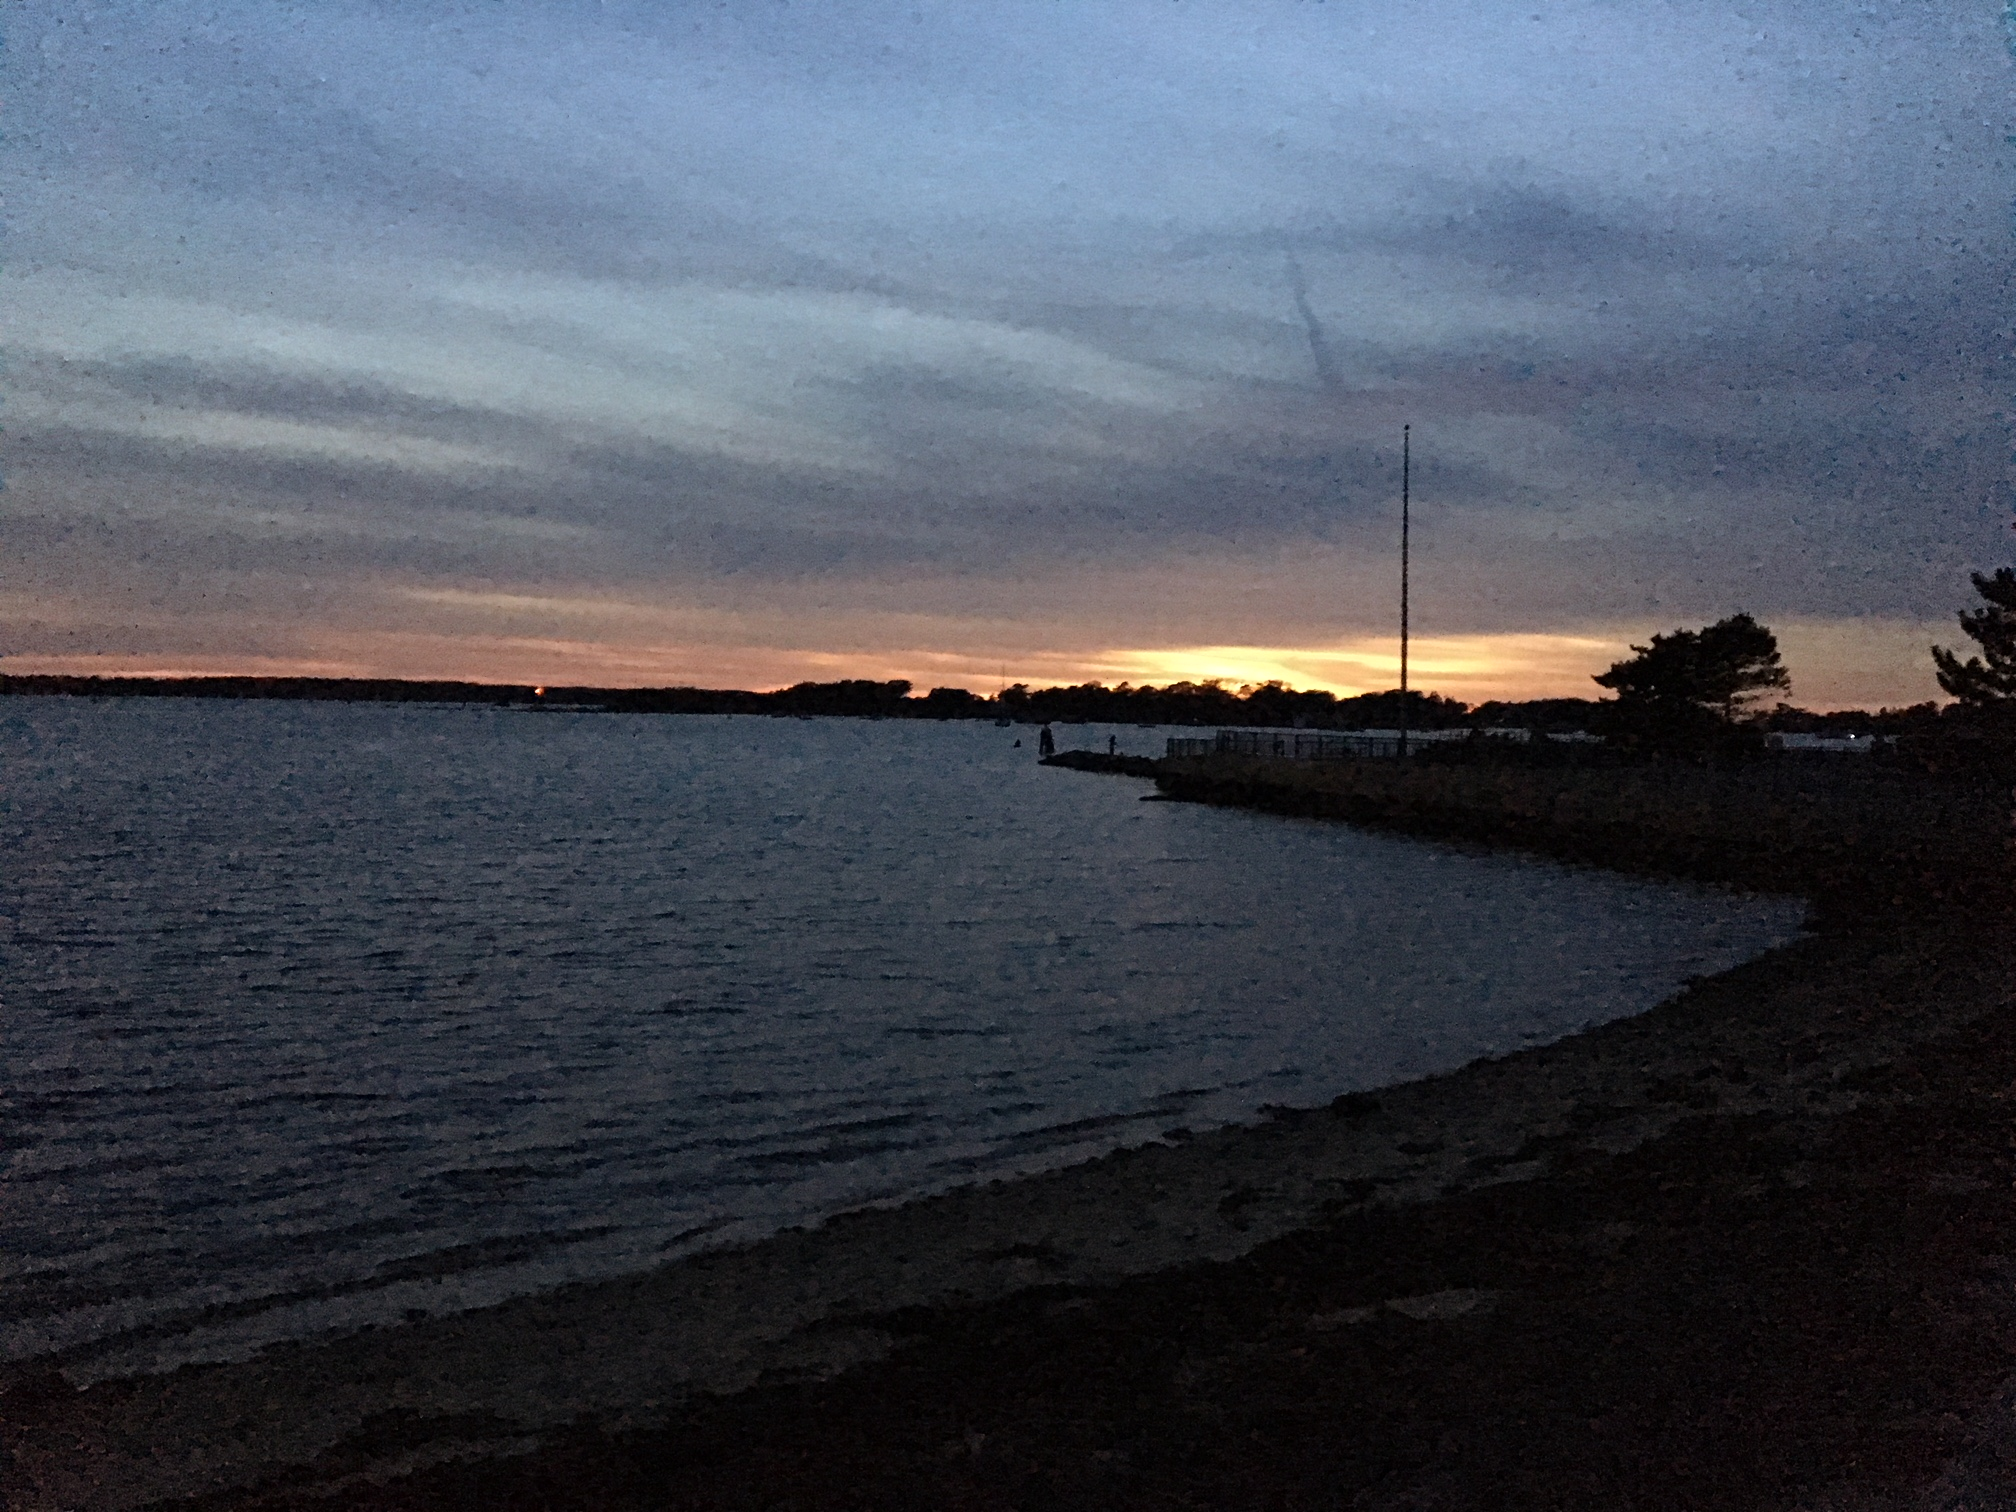 Evening view across Great Harbor.